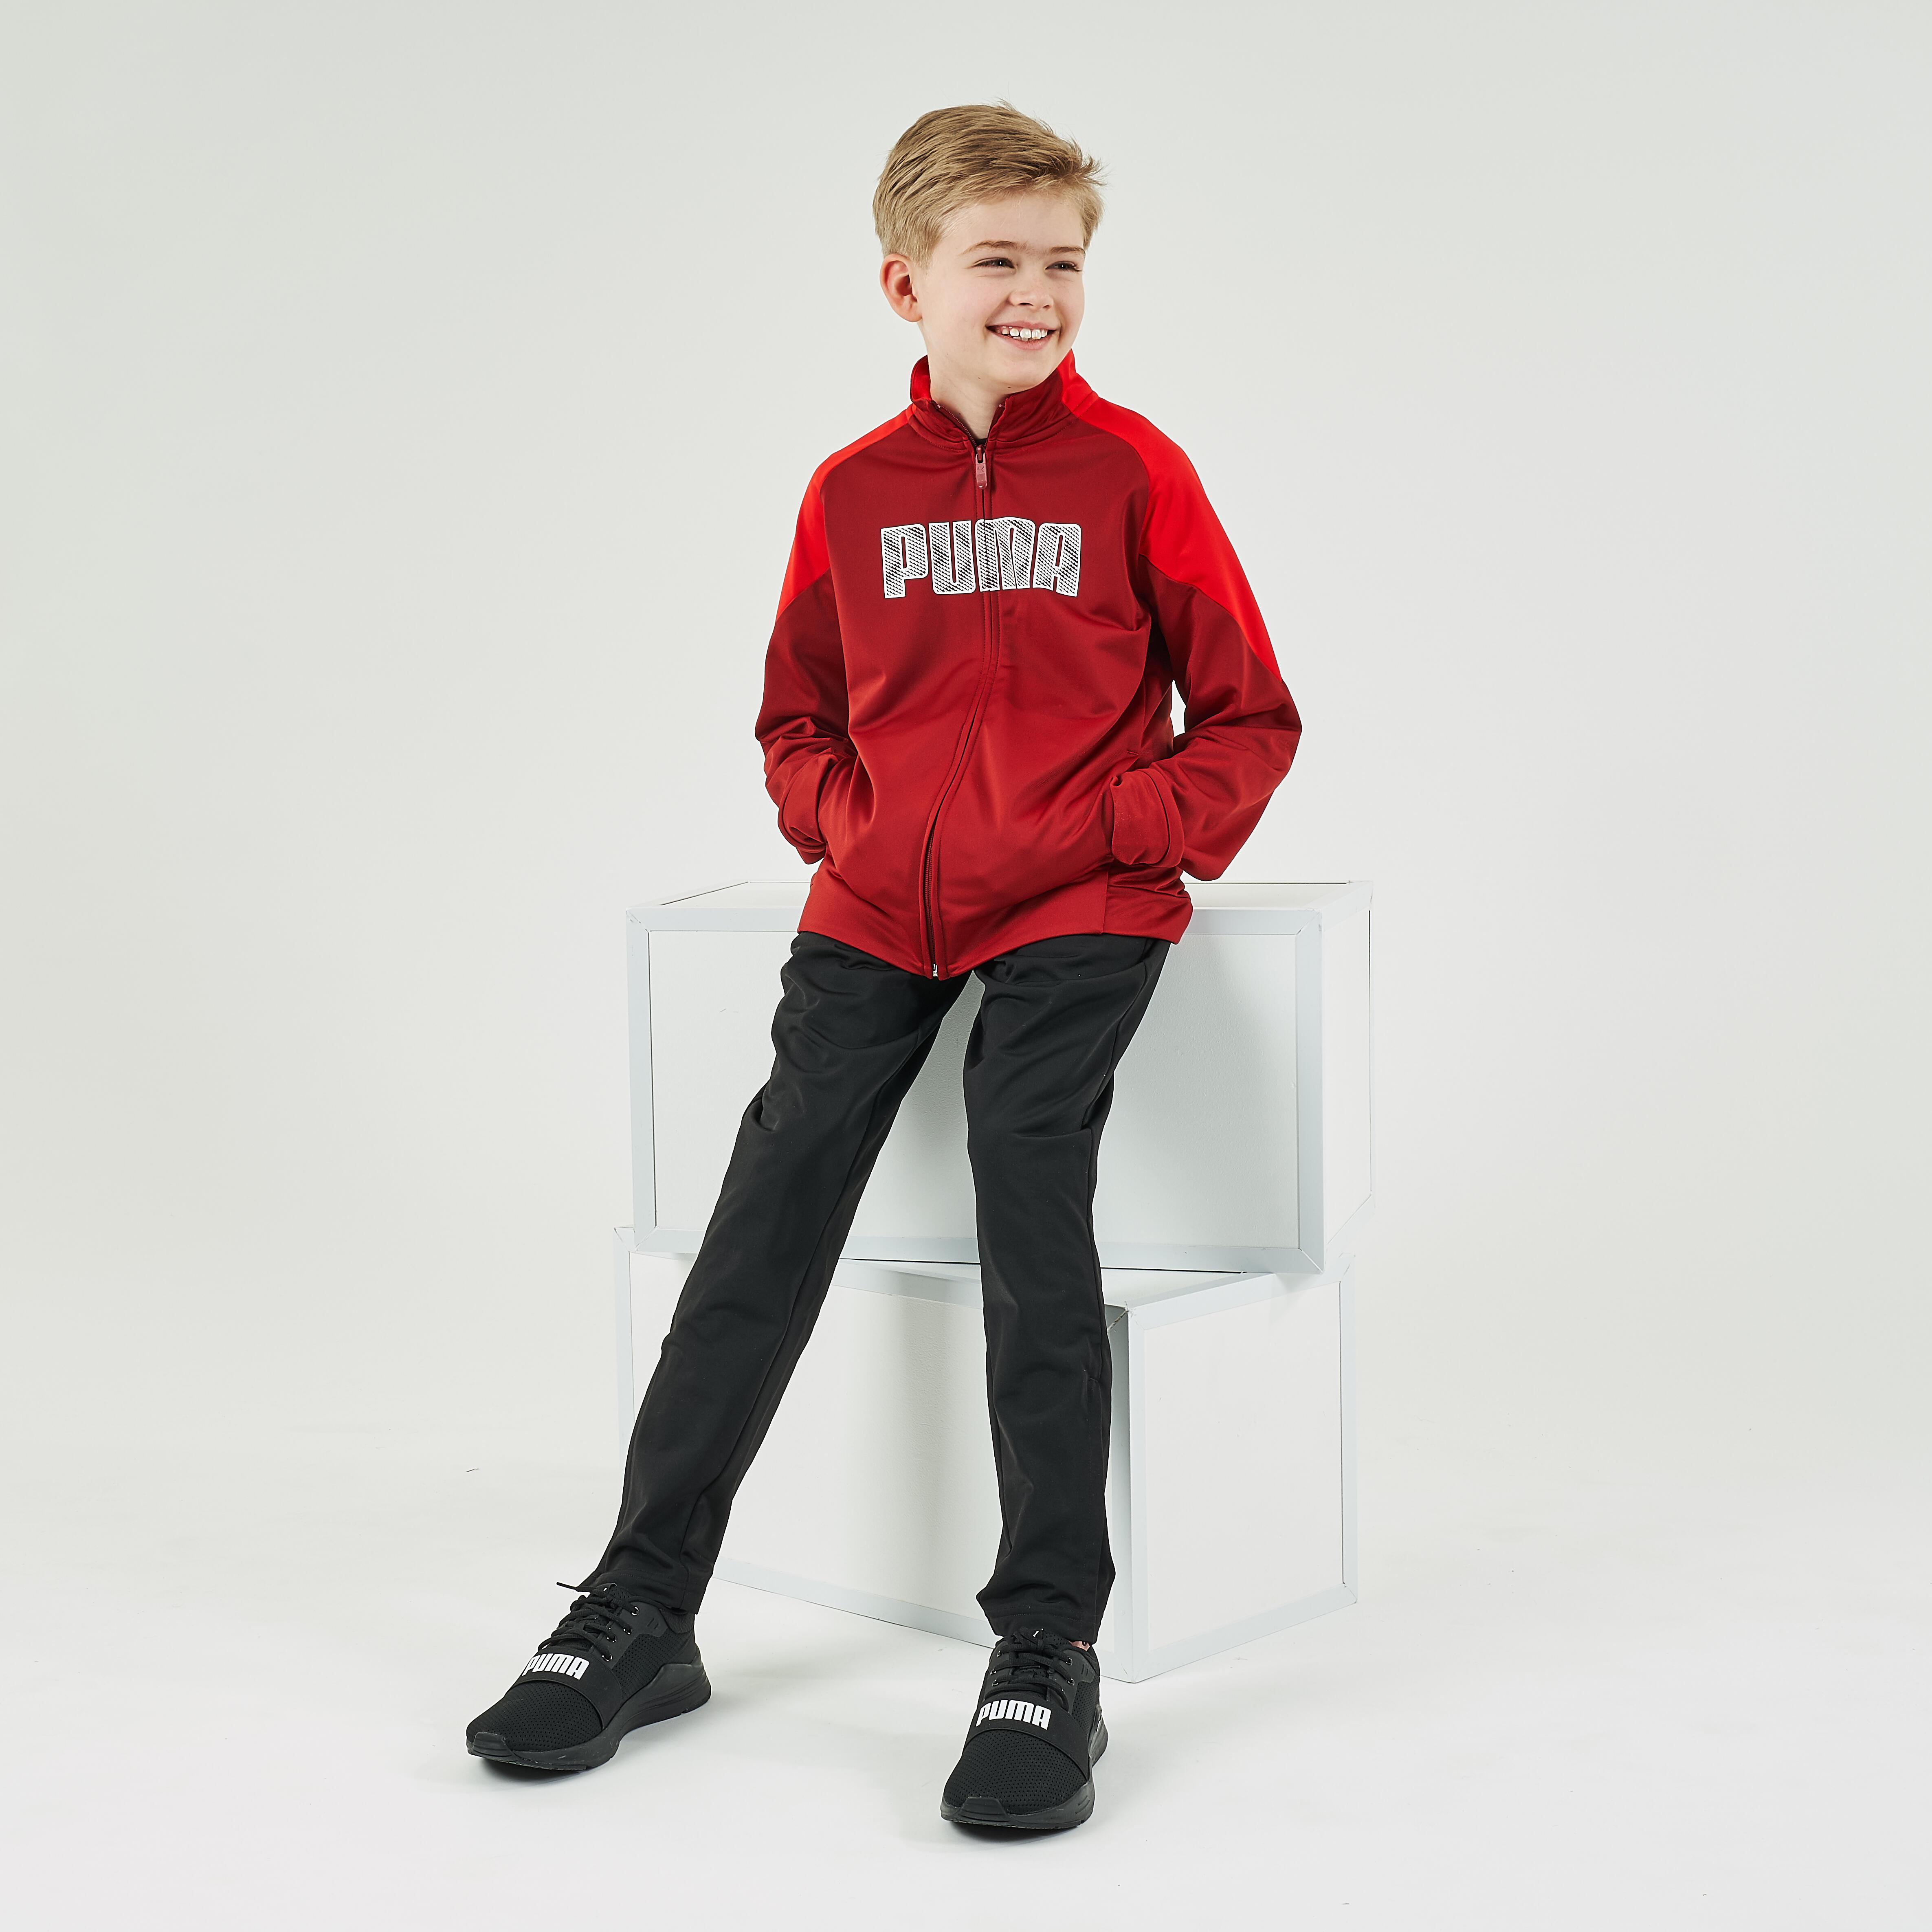 Trainingsanzug Puma Kinder rot/schwarz bedruckt